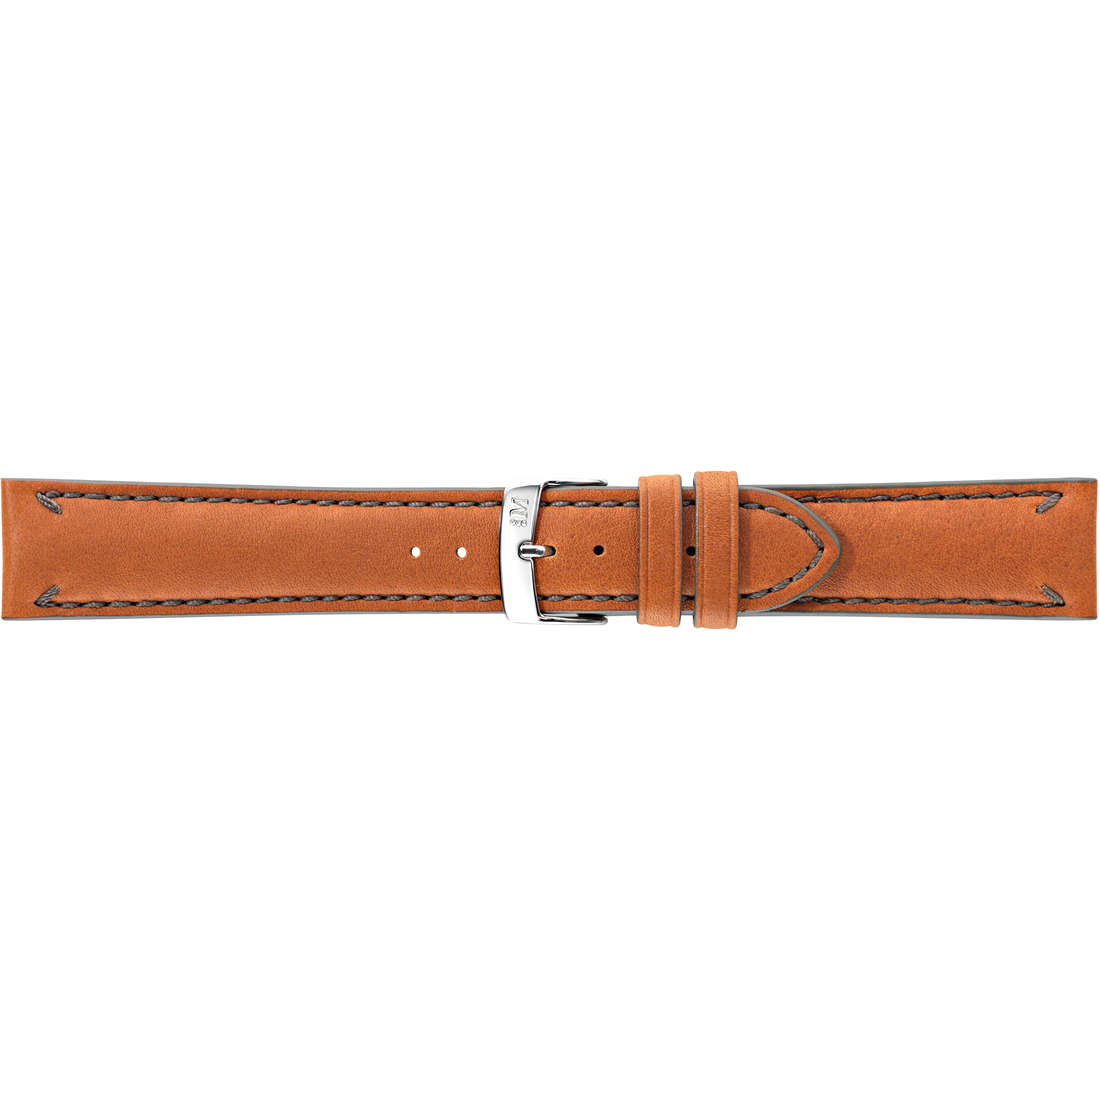 montre bande de montres homme Morellato Manufatti A01X4540A61044CR22